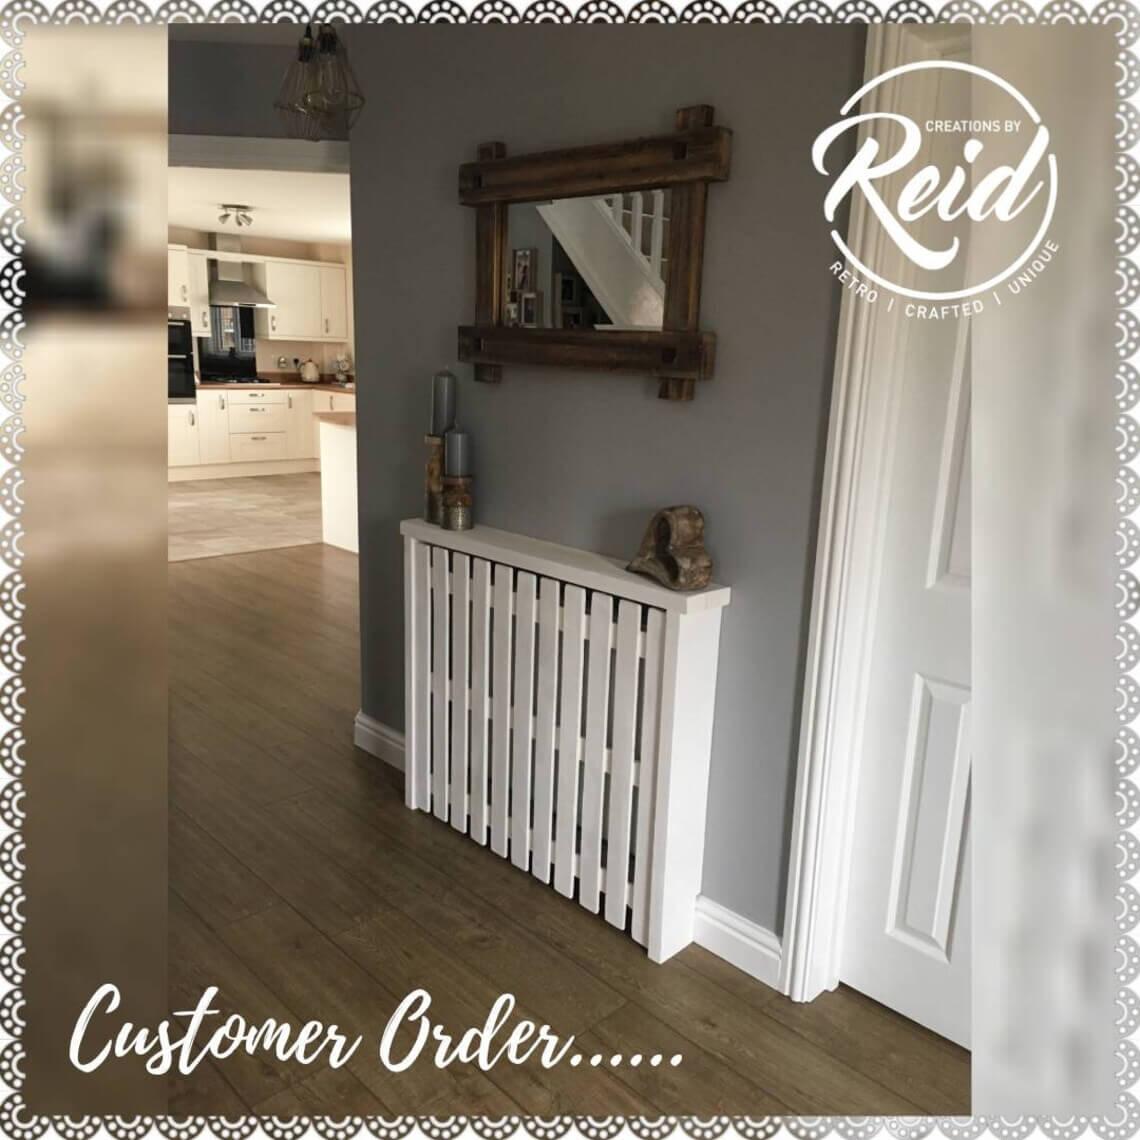 Rustic Handmade Wooden Radiator Cover